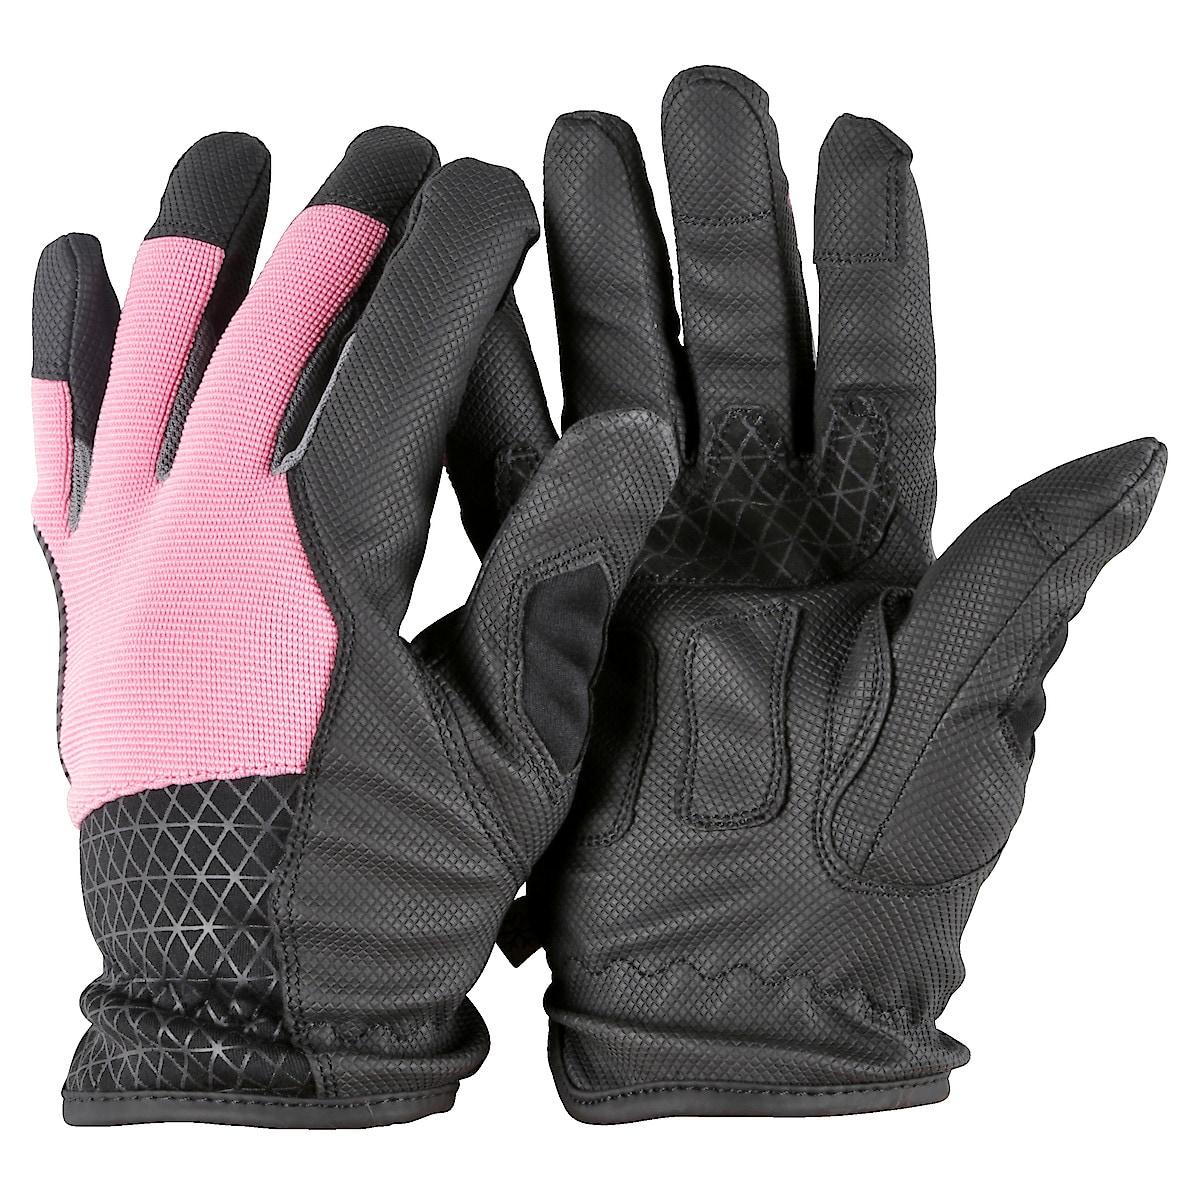 Arbeitshandschuhe Winter, Signalfarbe rosa